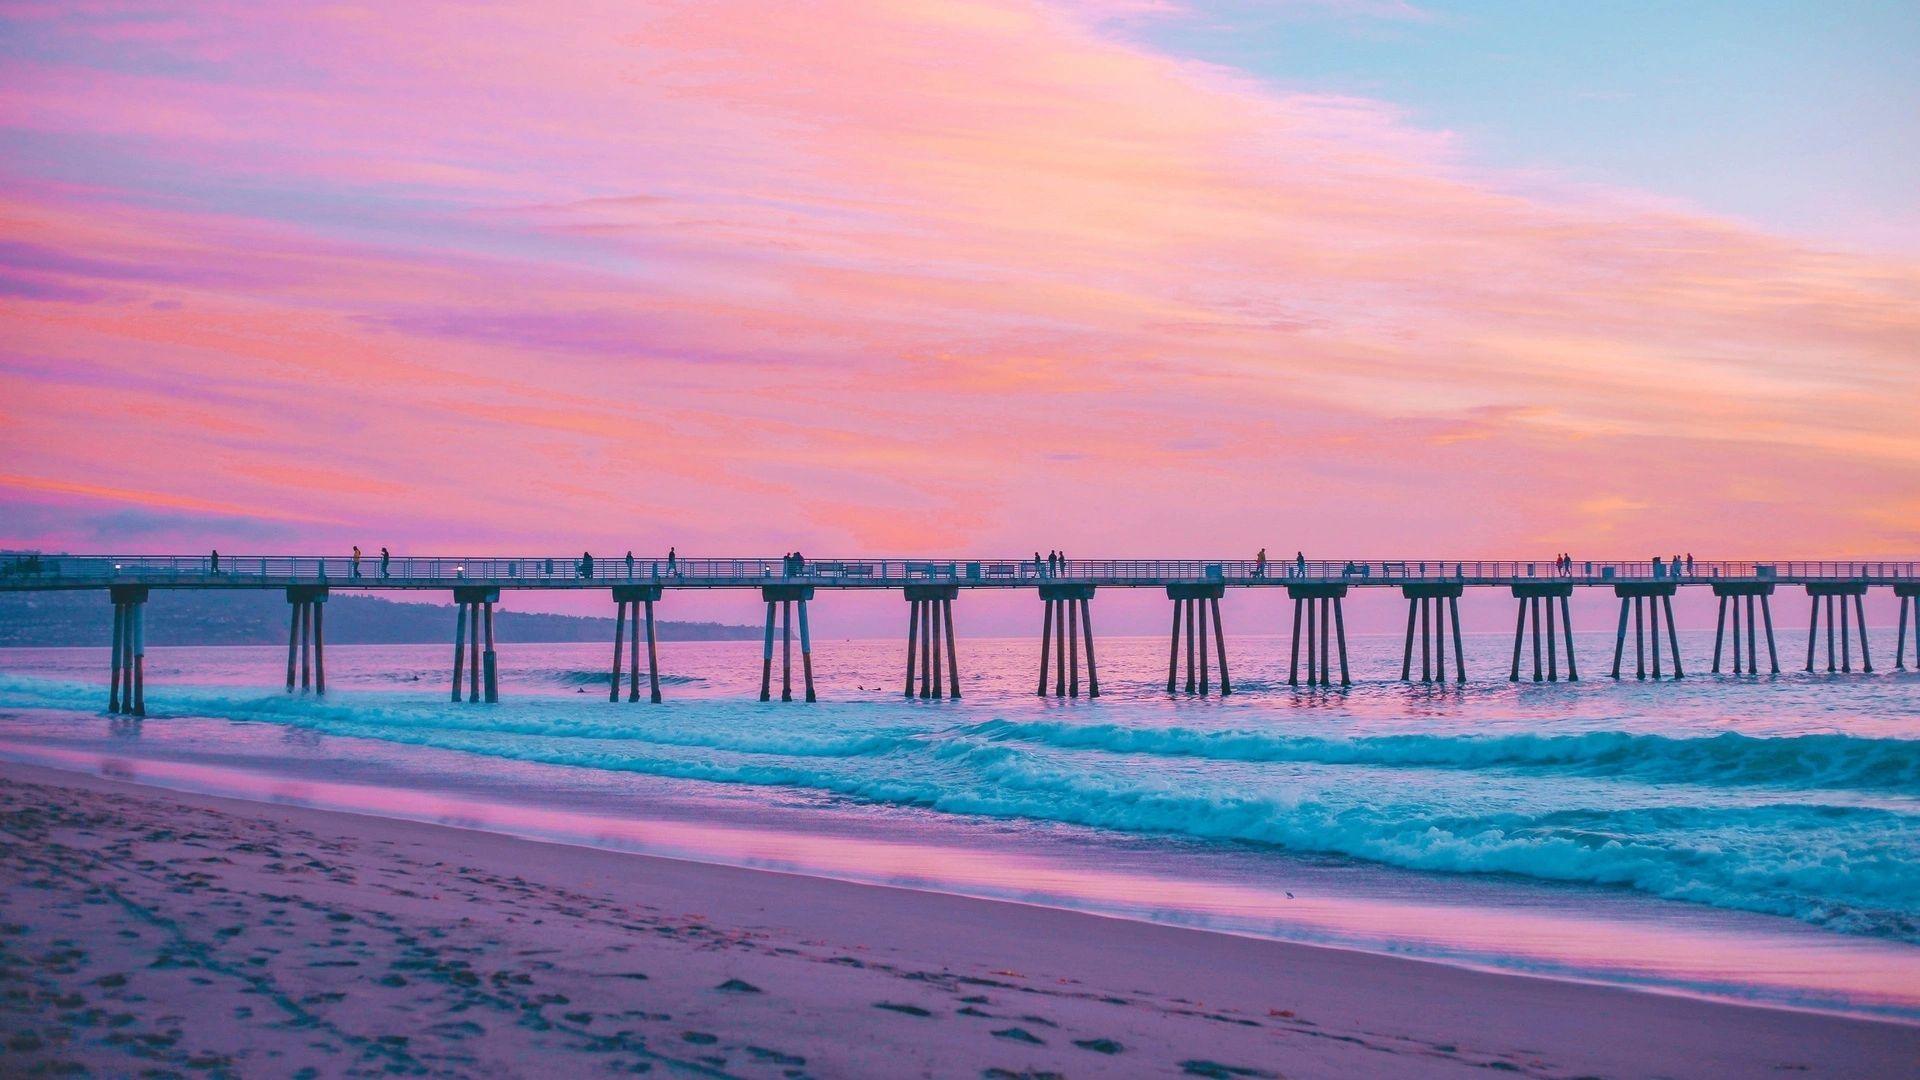 Pin By Julie Tremmel On Unbelievable Views In 2020 Beach Wallpaper Hermosa Beach Pier Hermosa Beach